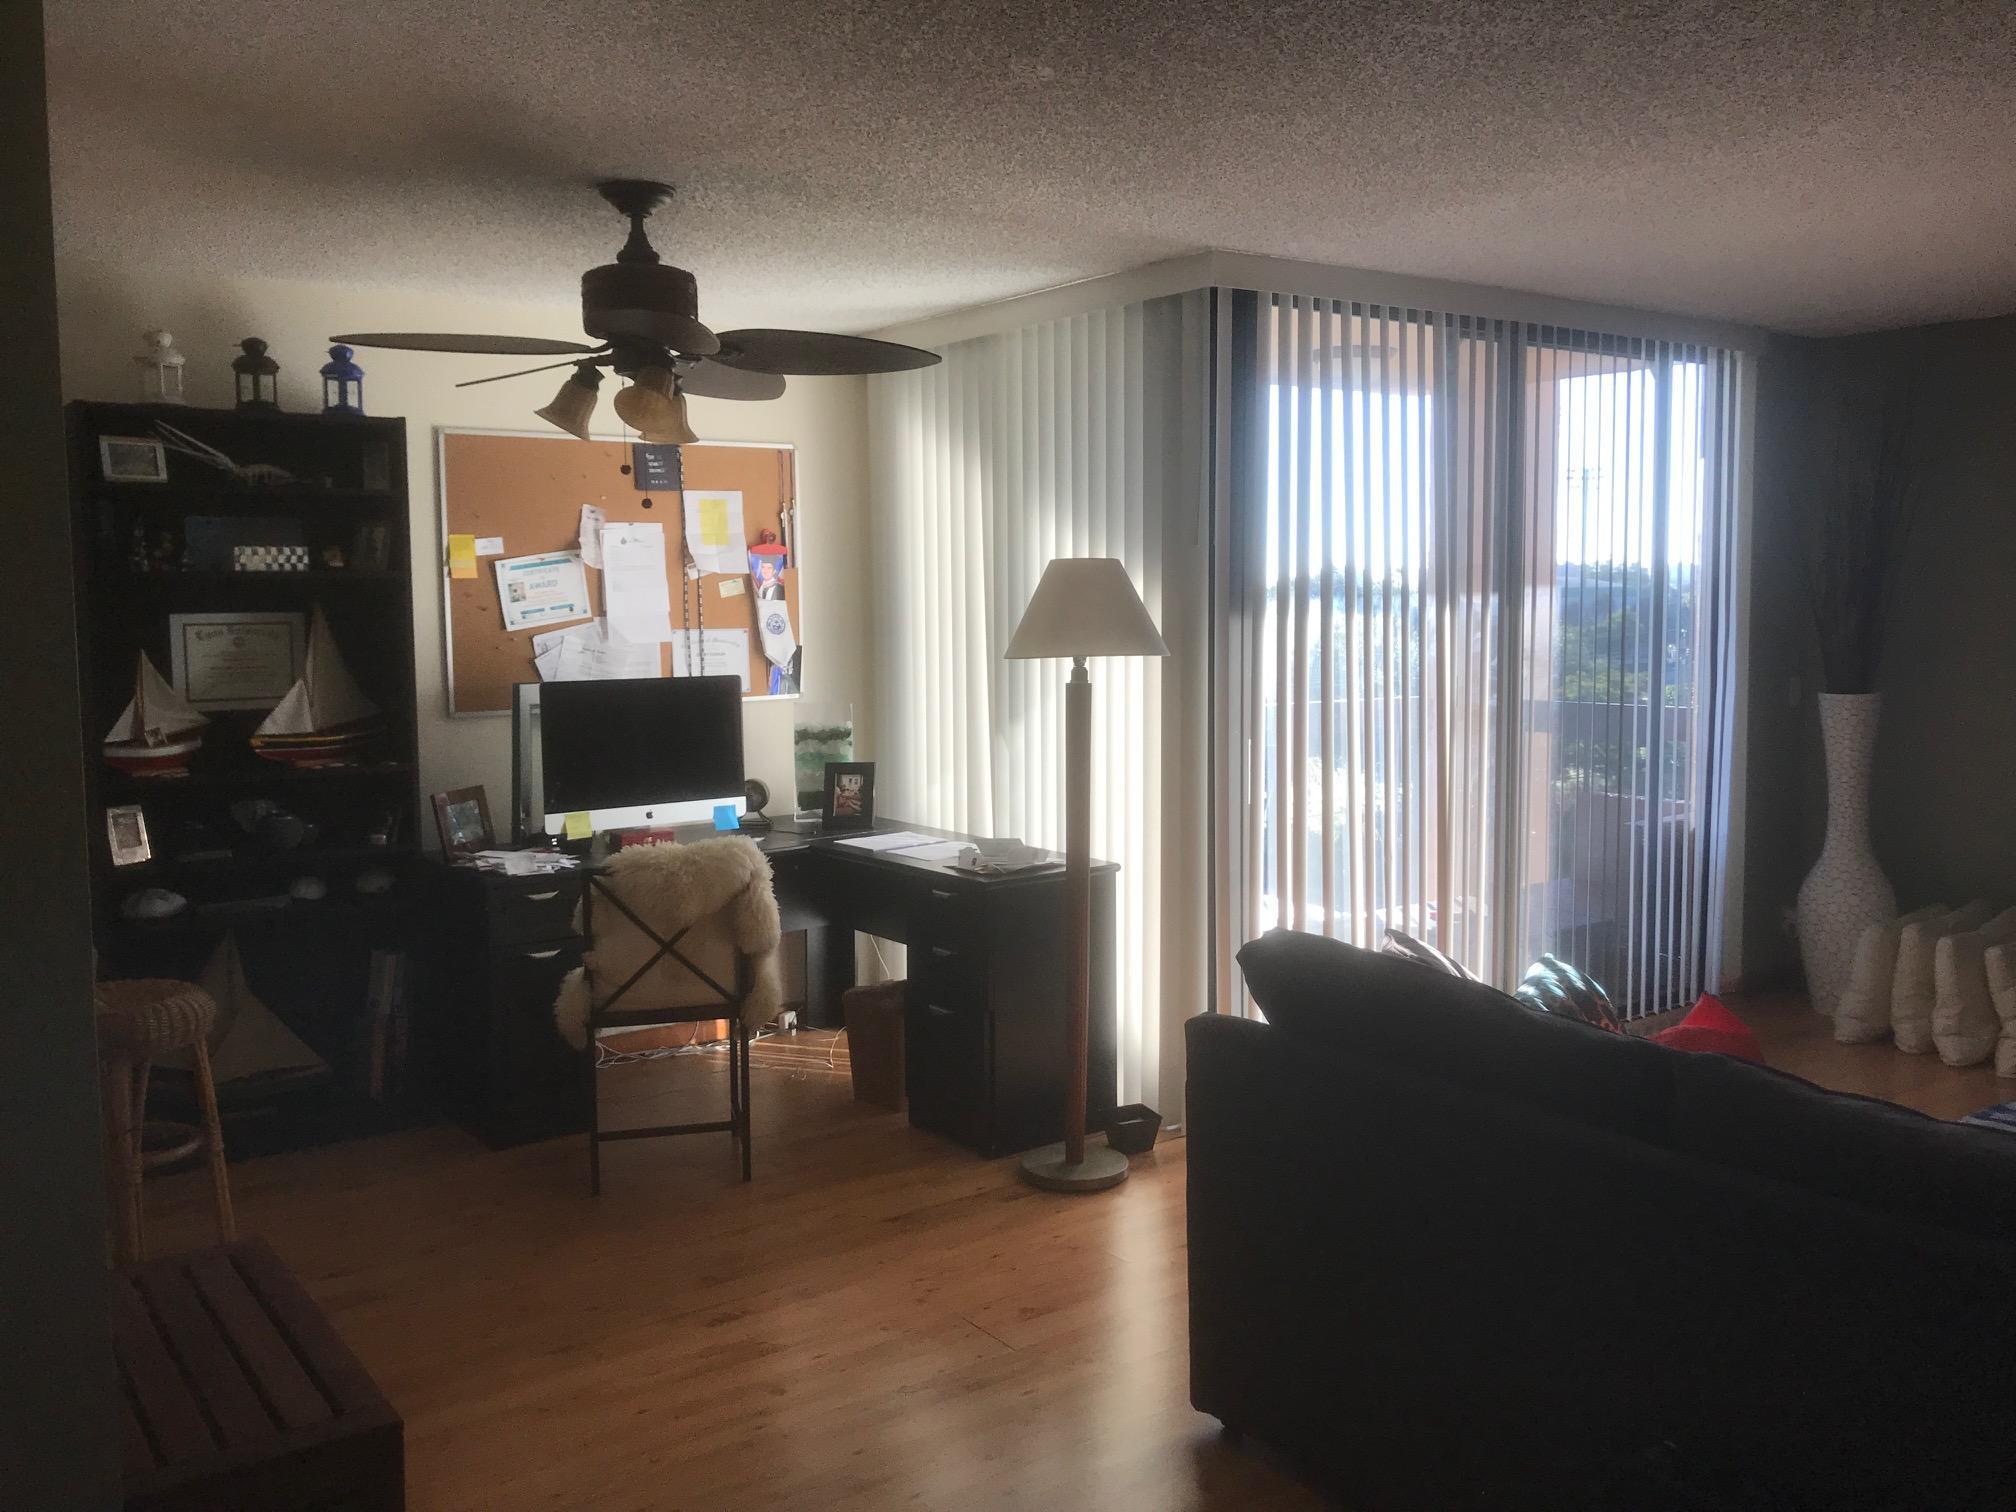 450 Egret Circle Unit Apt 9501 Delray Beach, FL 33444 - MLS #: RX-10380359